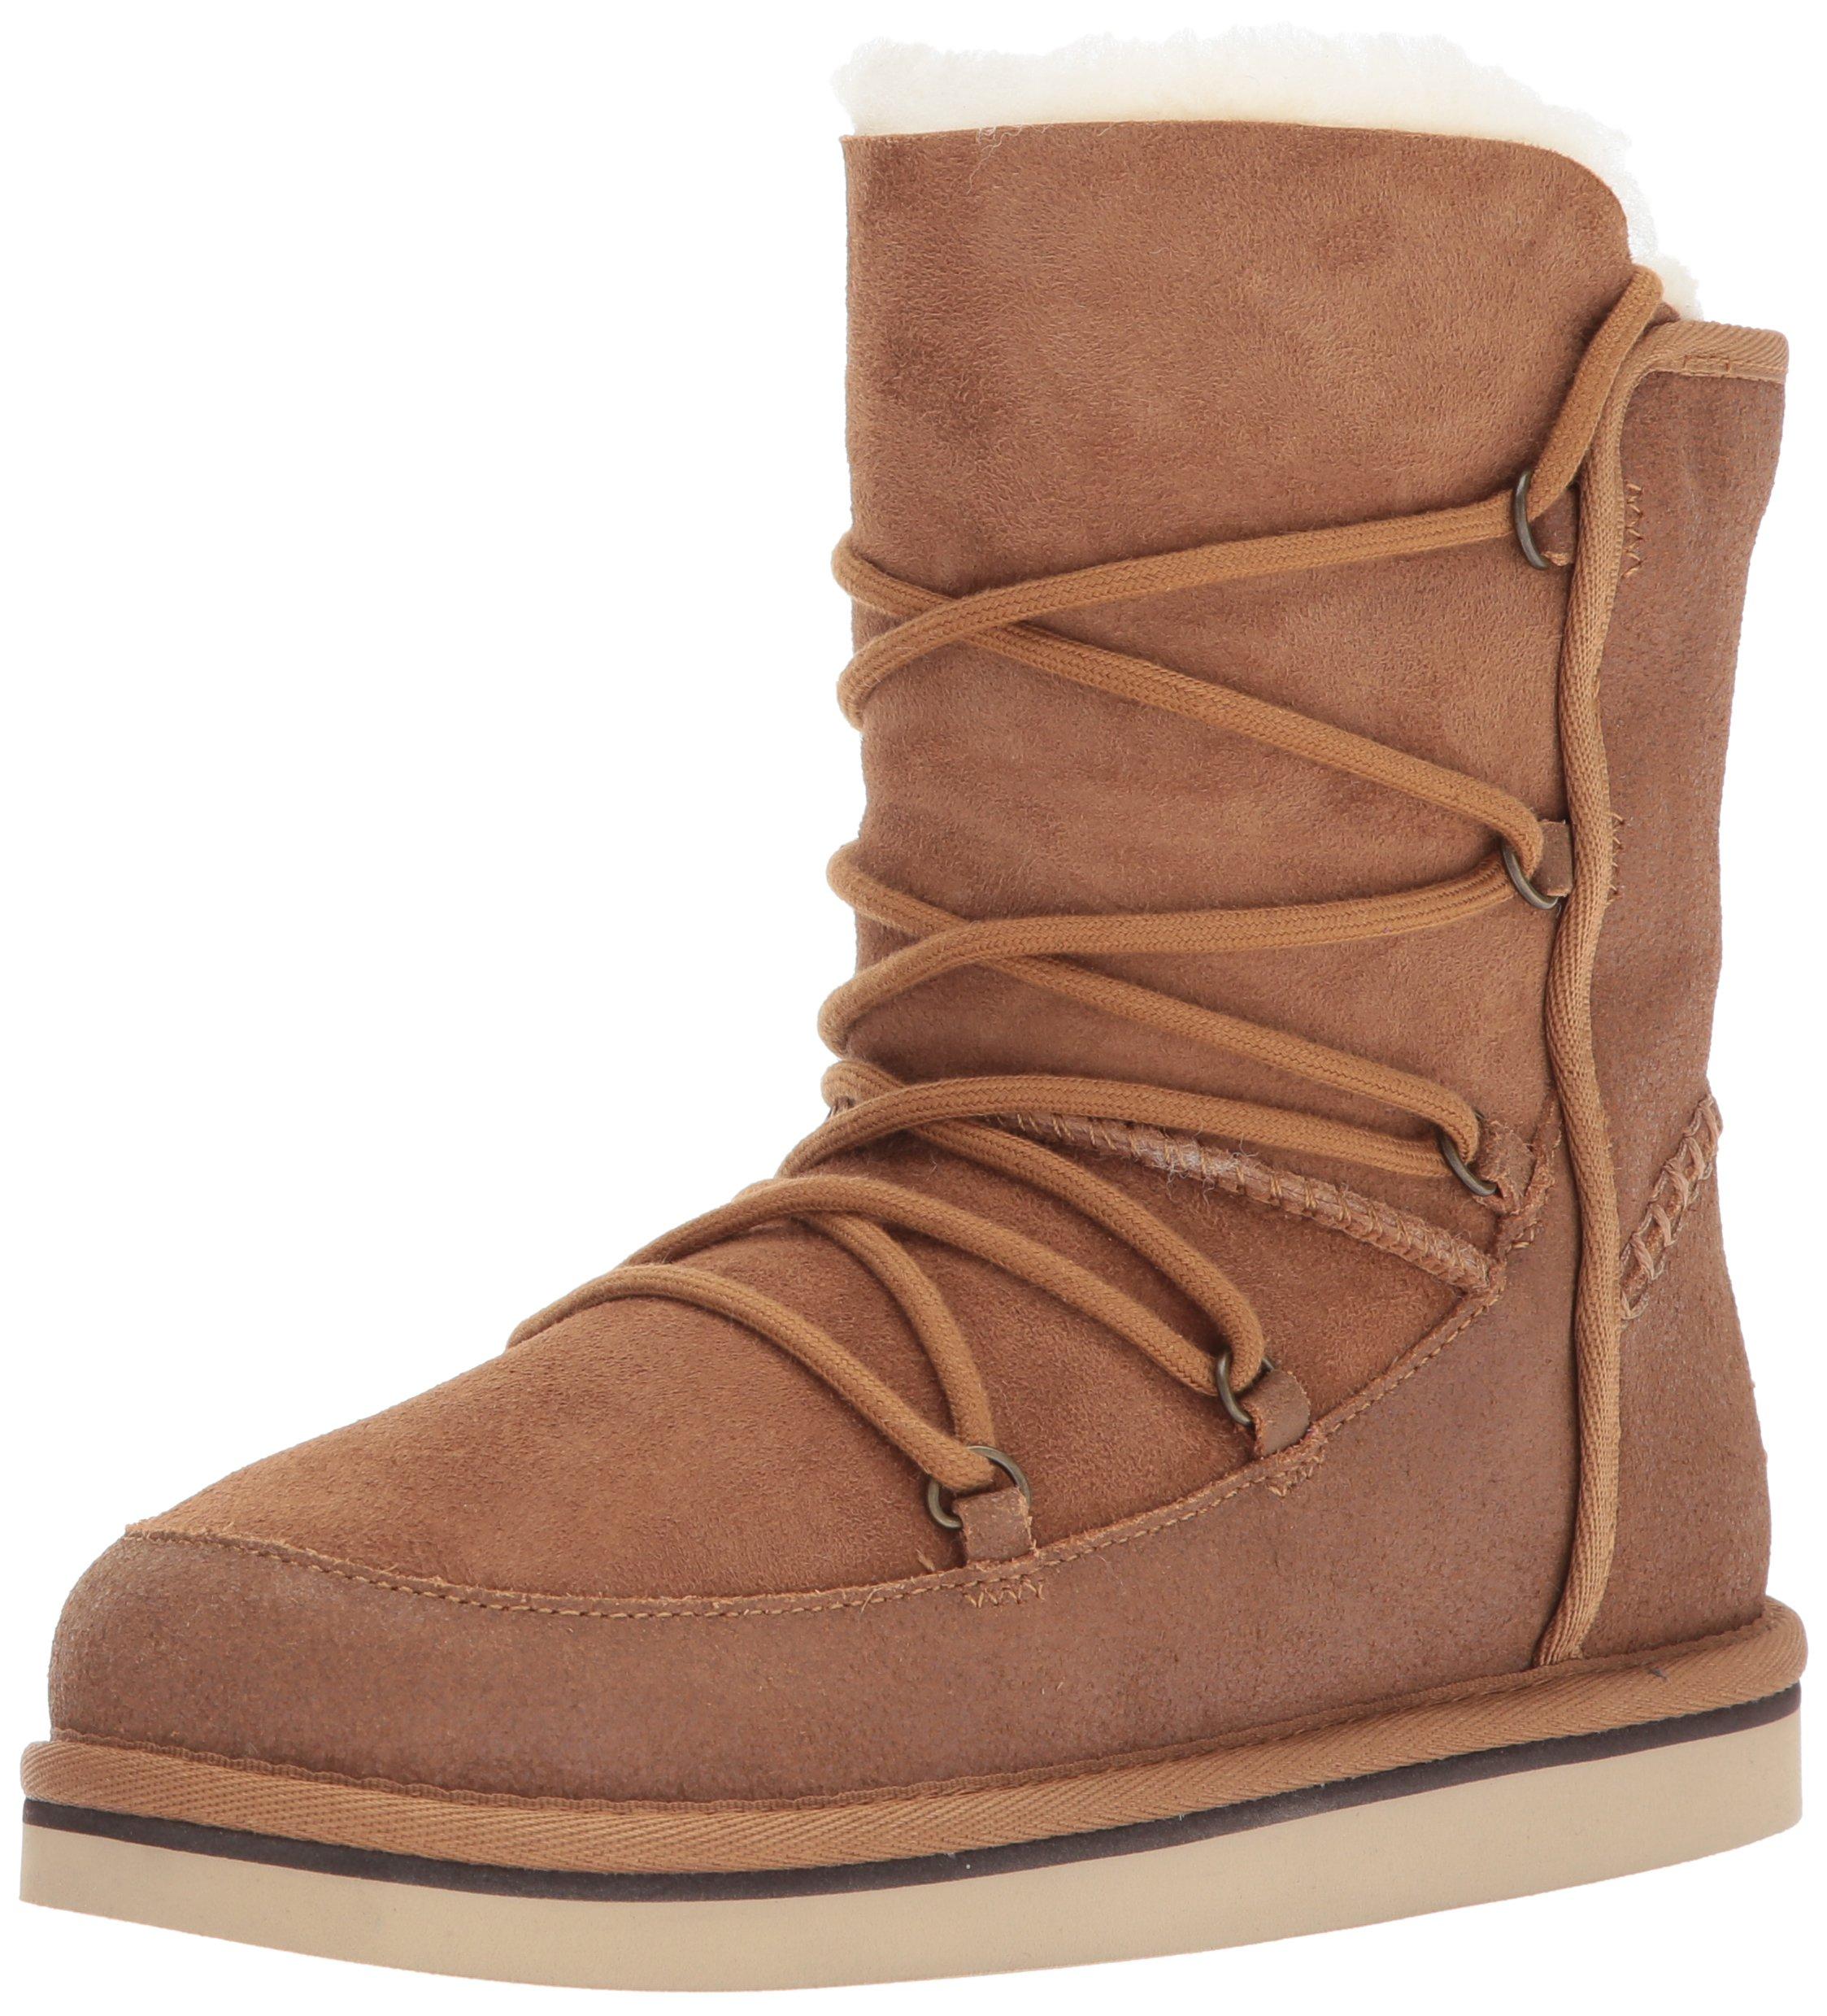 UGG Kids K Eliss Pull-on Boot, Chestnut, 5 M US Big Kid